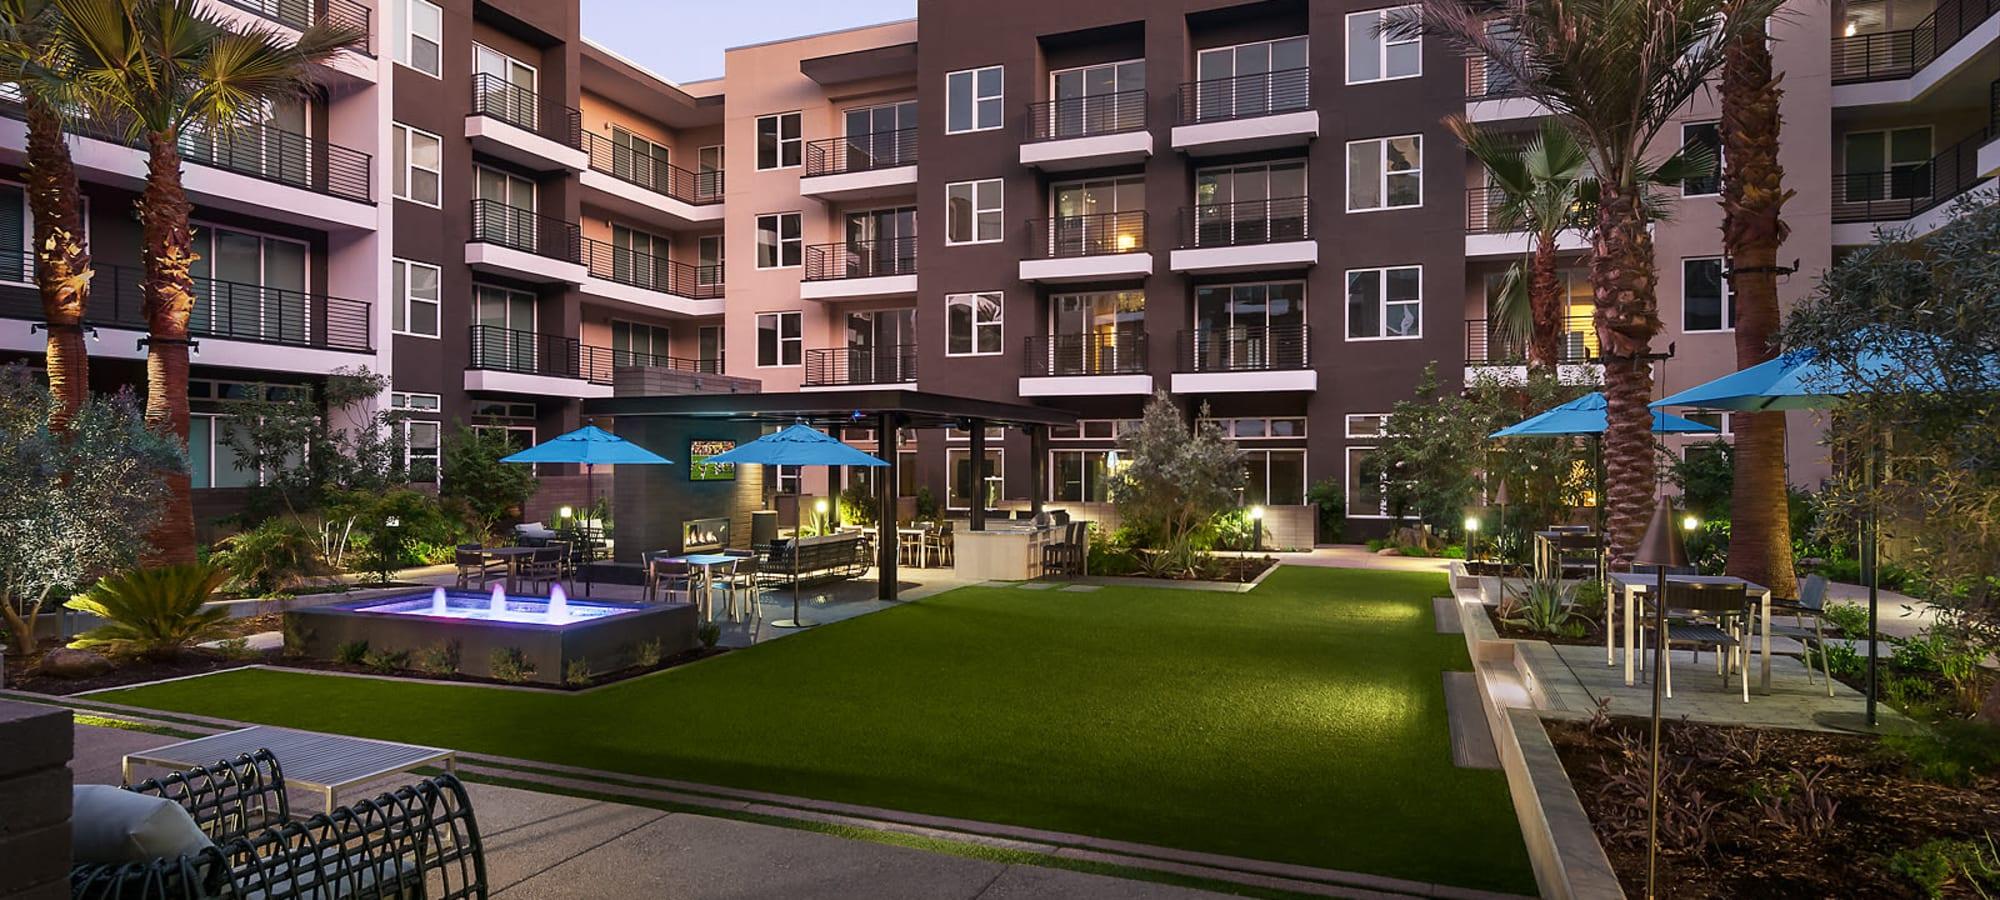 Beautiful courtyard at The Halsten at Chauncey Lane in Scottsdale, Arizona